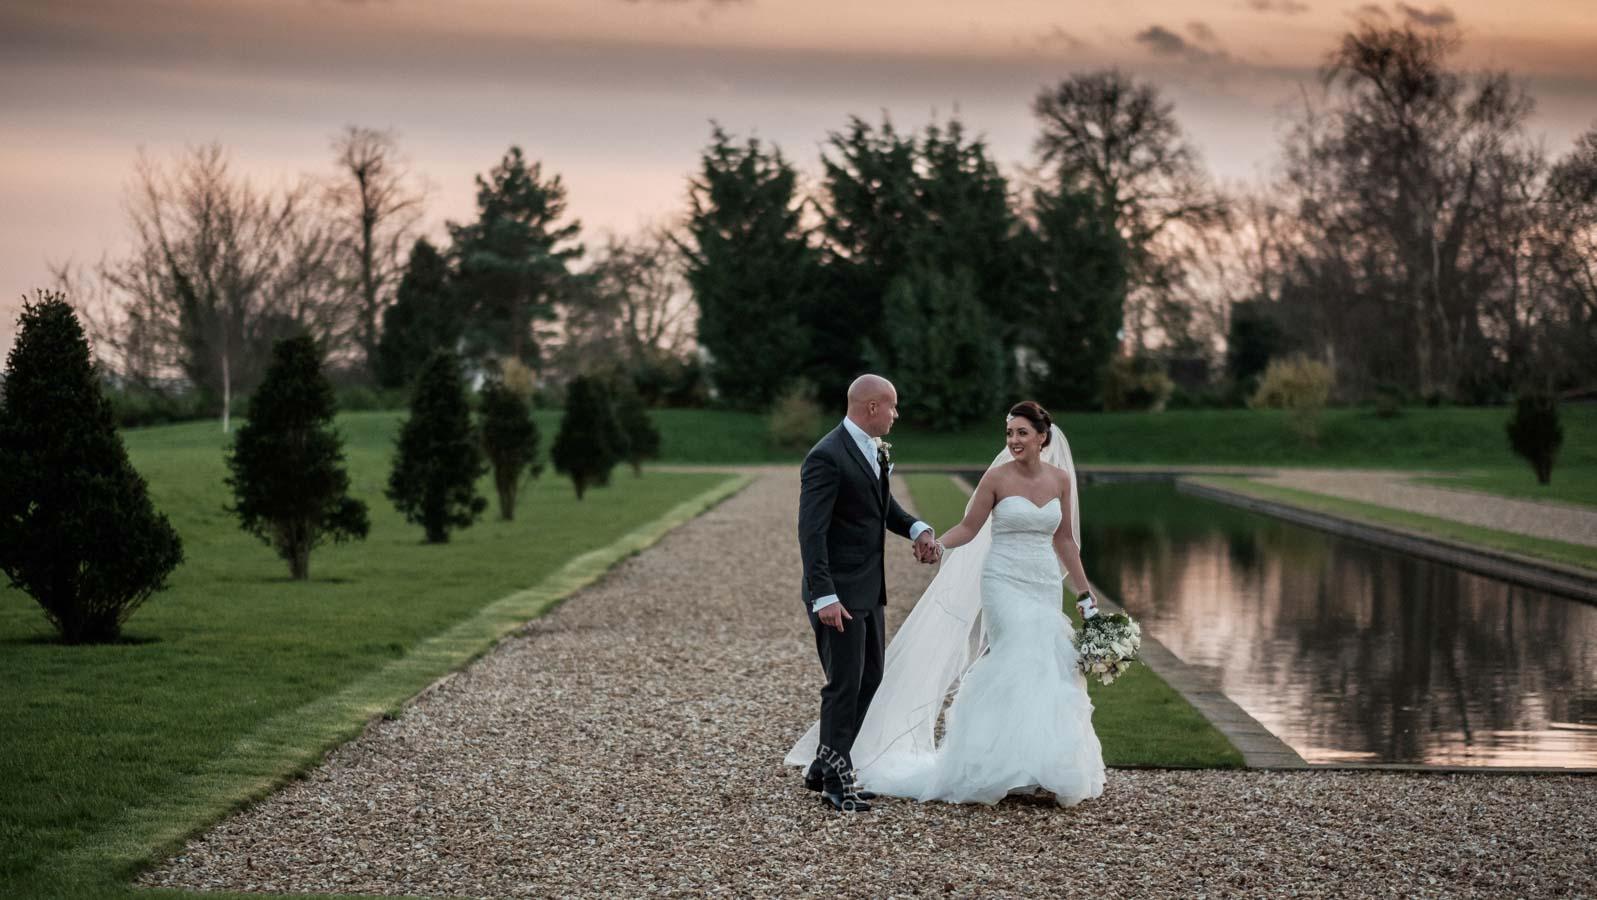 Stubton-Hall-Wedding-Photography-060